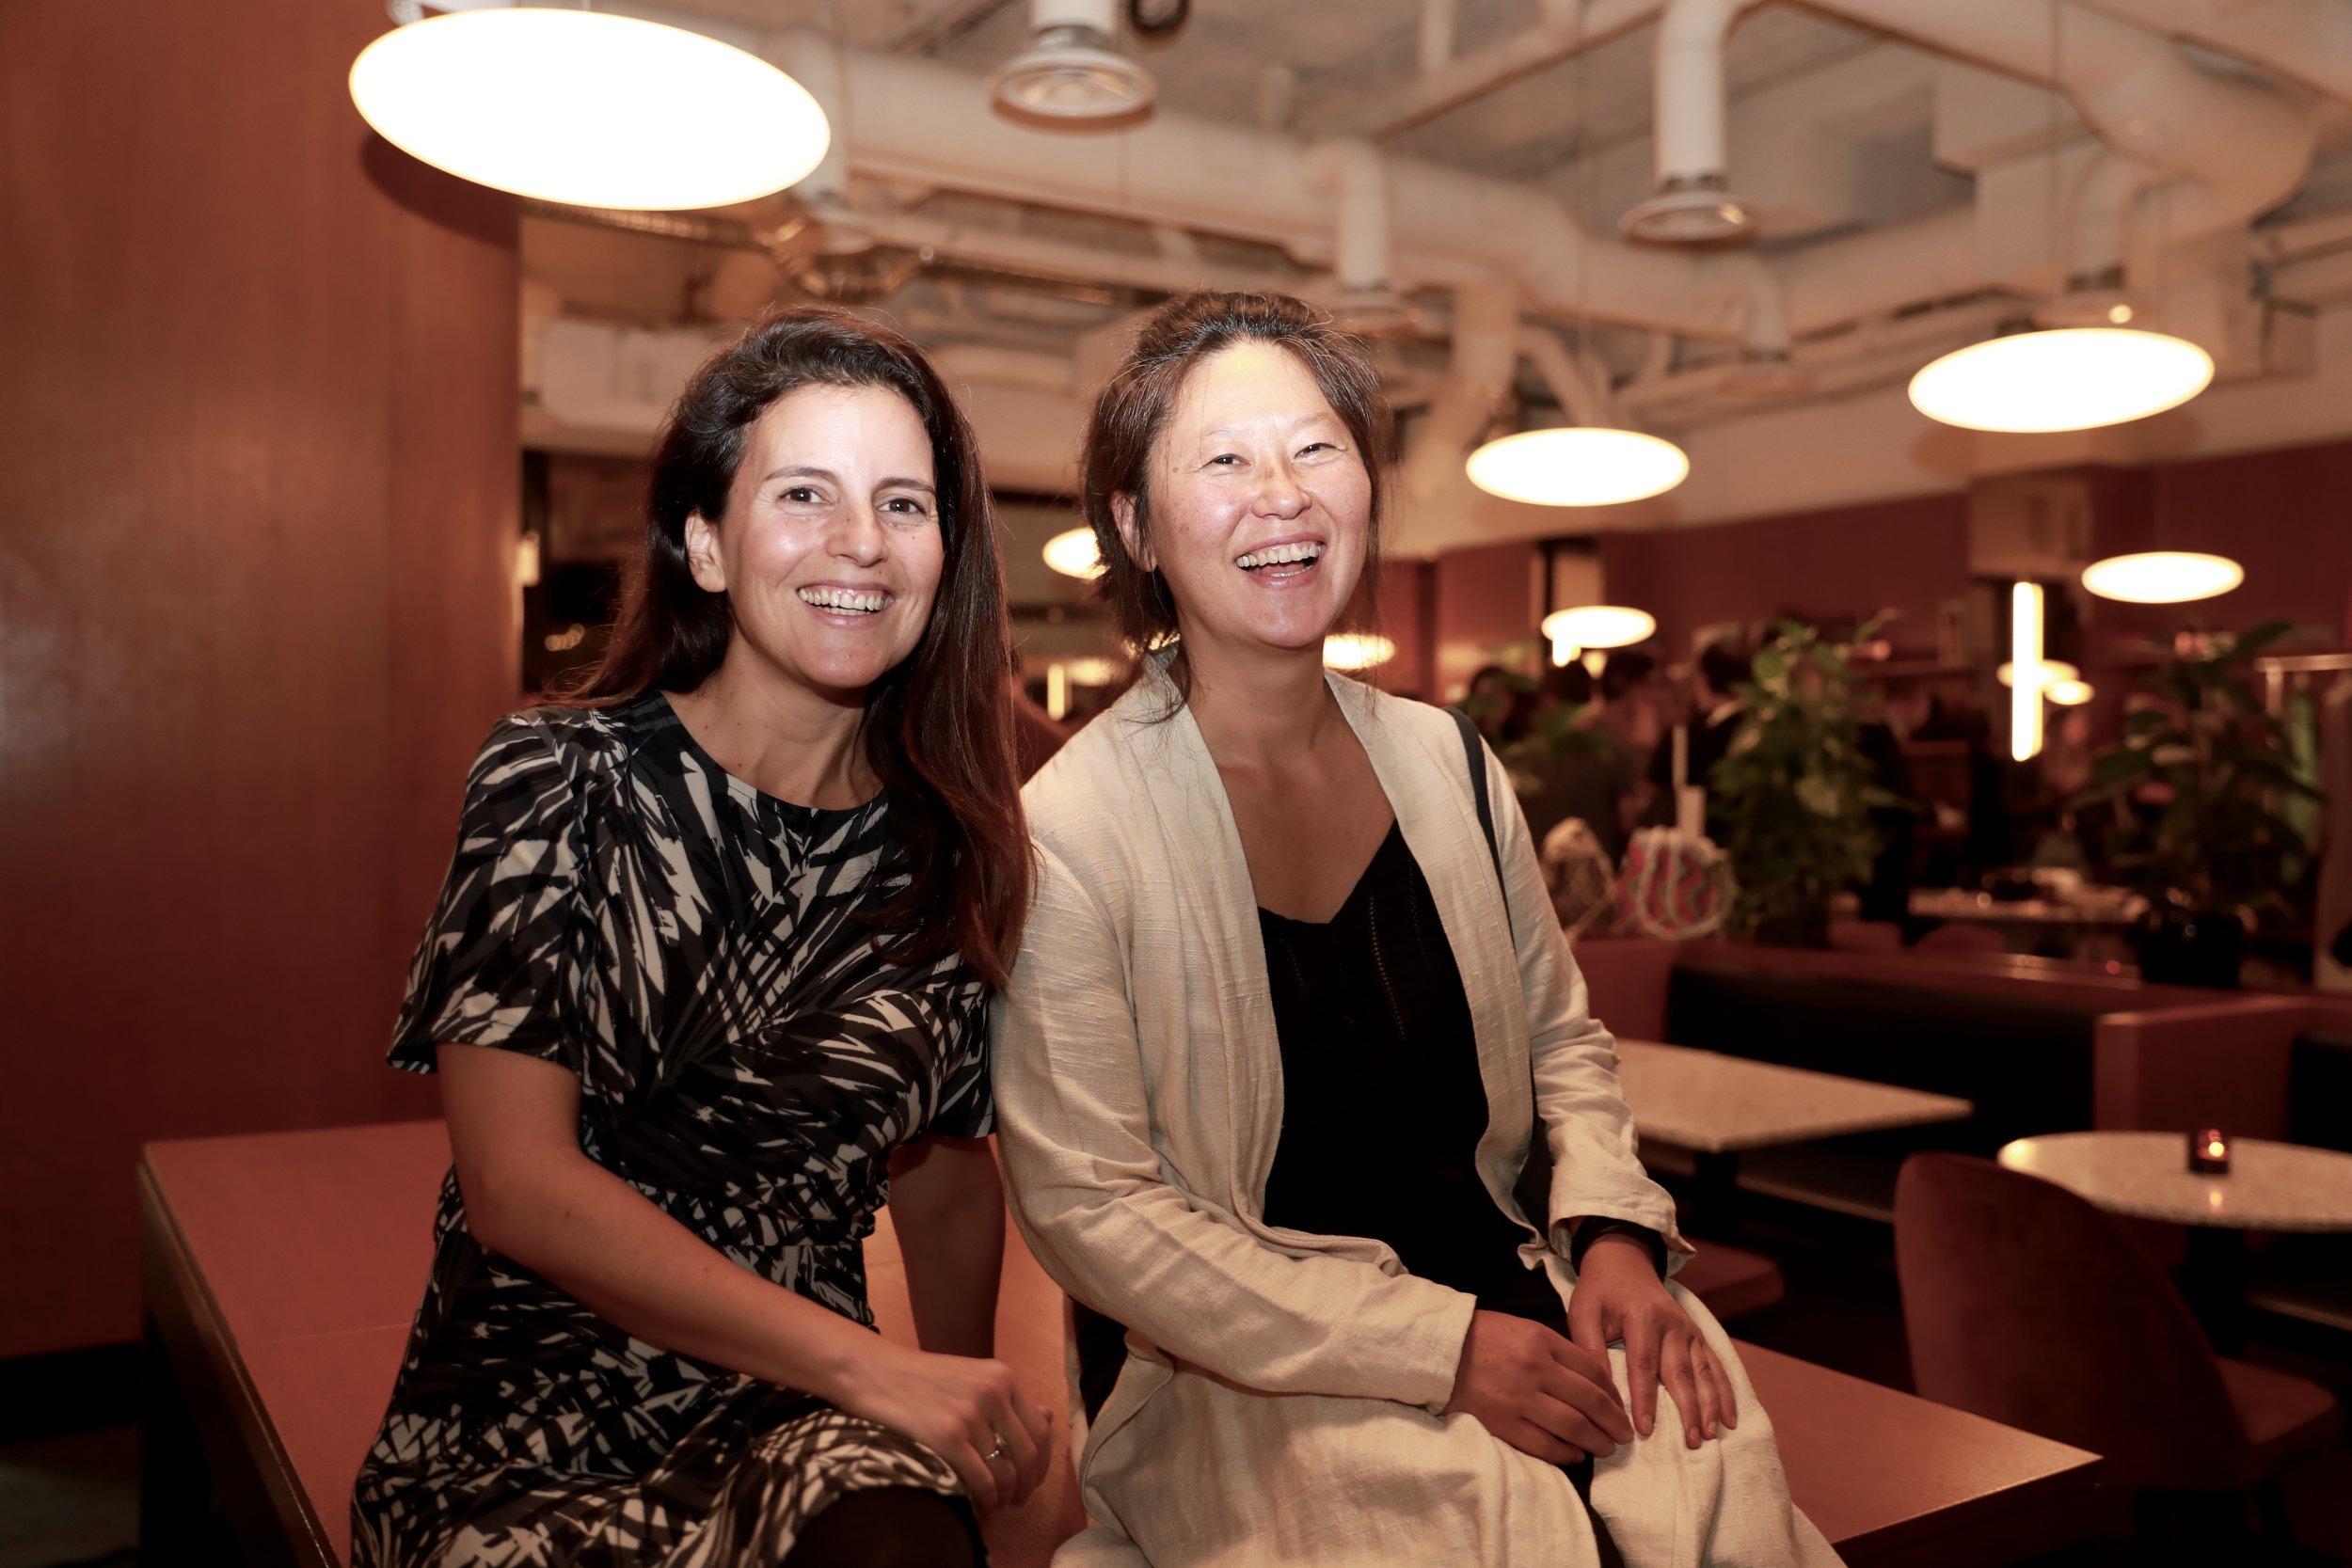 Bureau Estrée Latin Connection Fashion Farida Tir Teerlinck